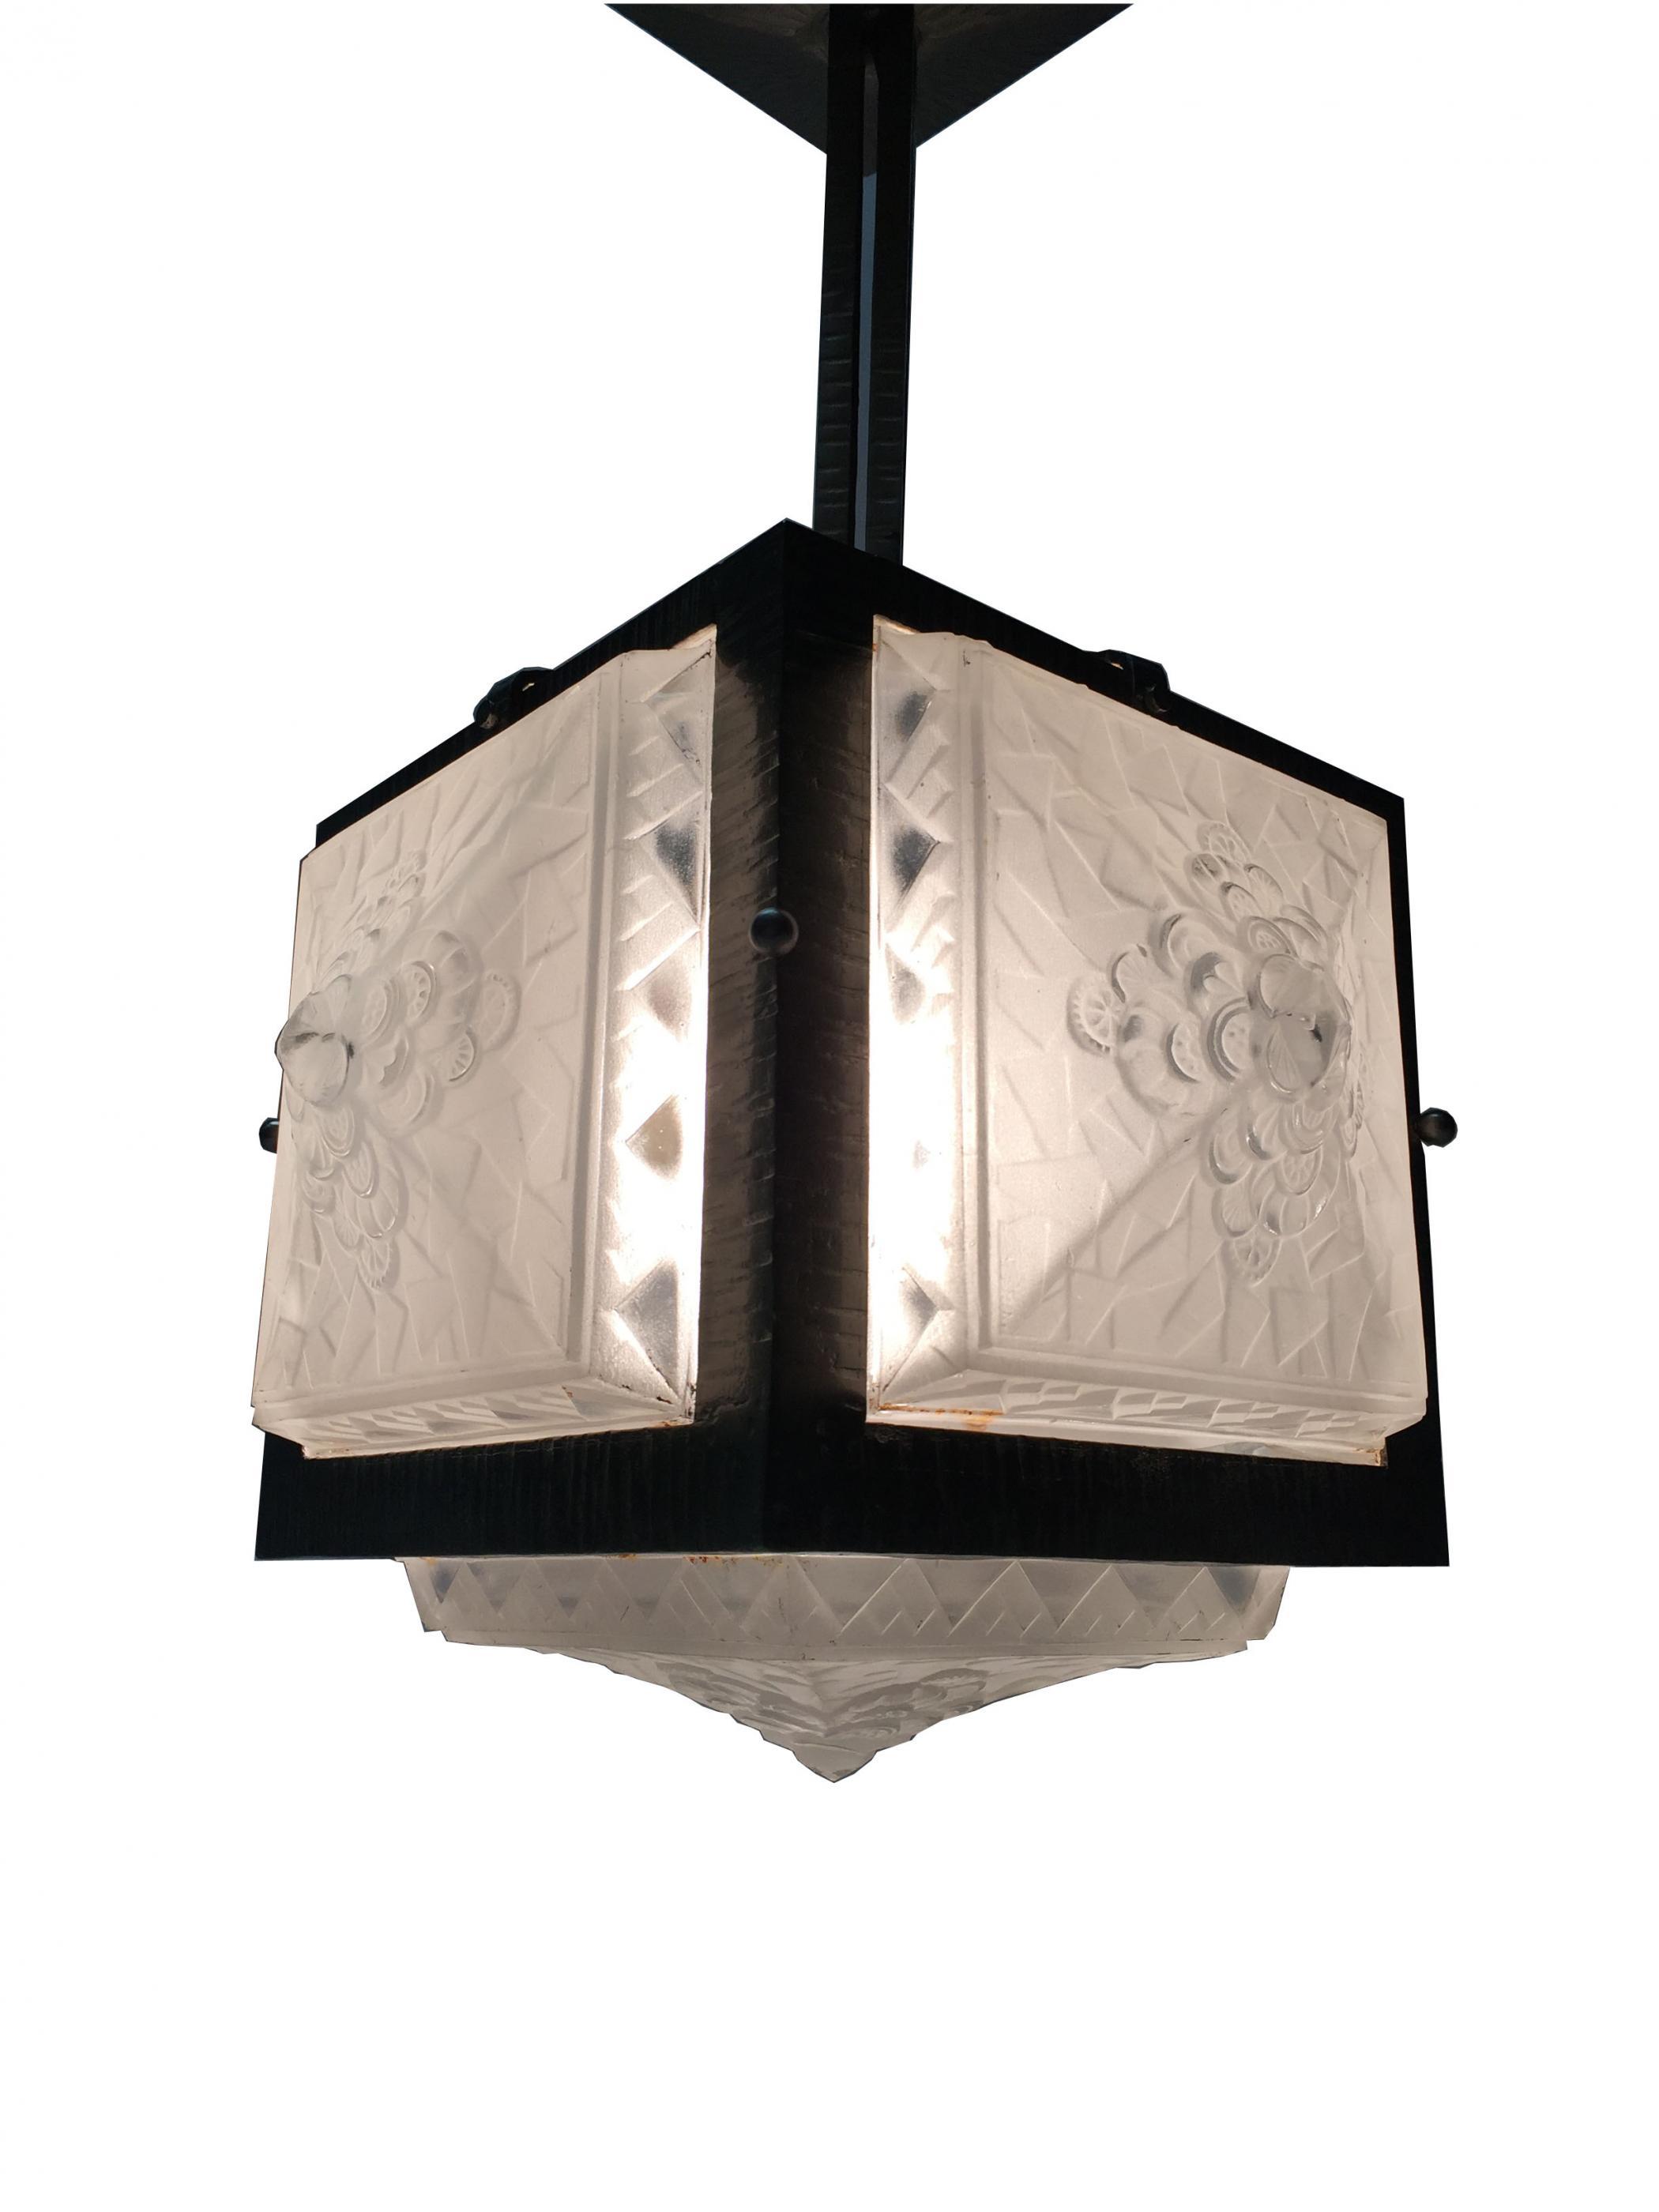 ceilings art chandelier sold shop vintage shades light glass ceiling etched deco s